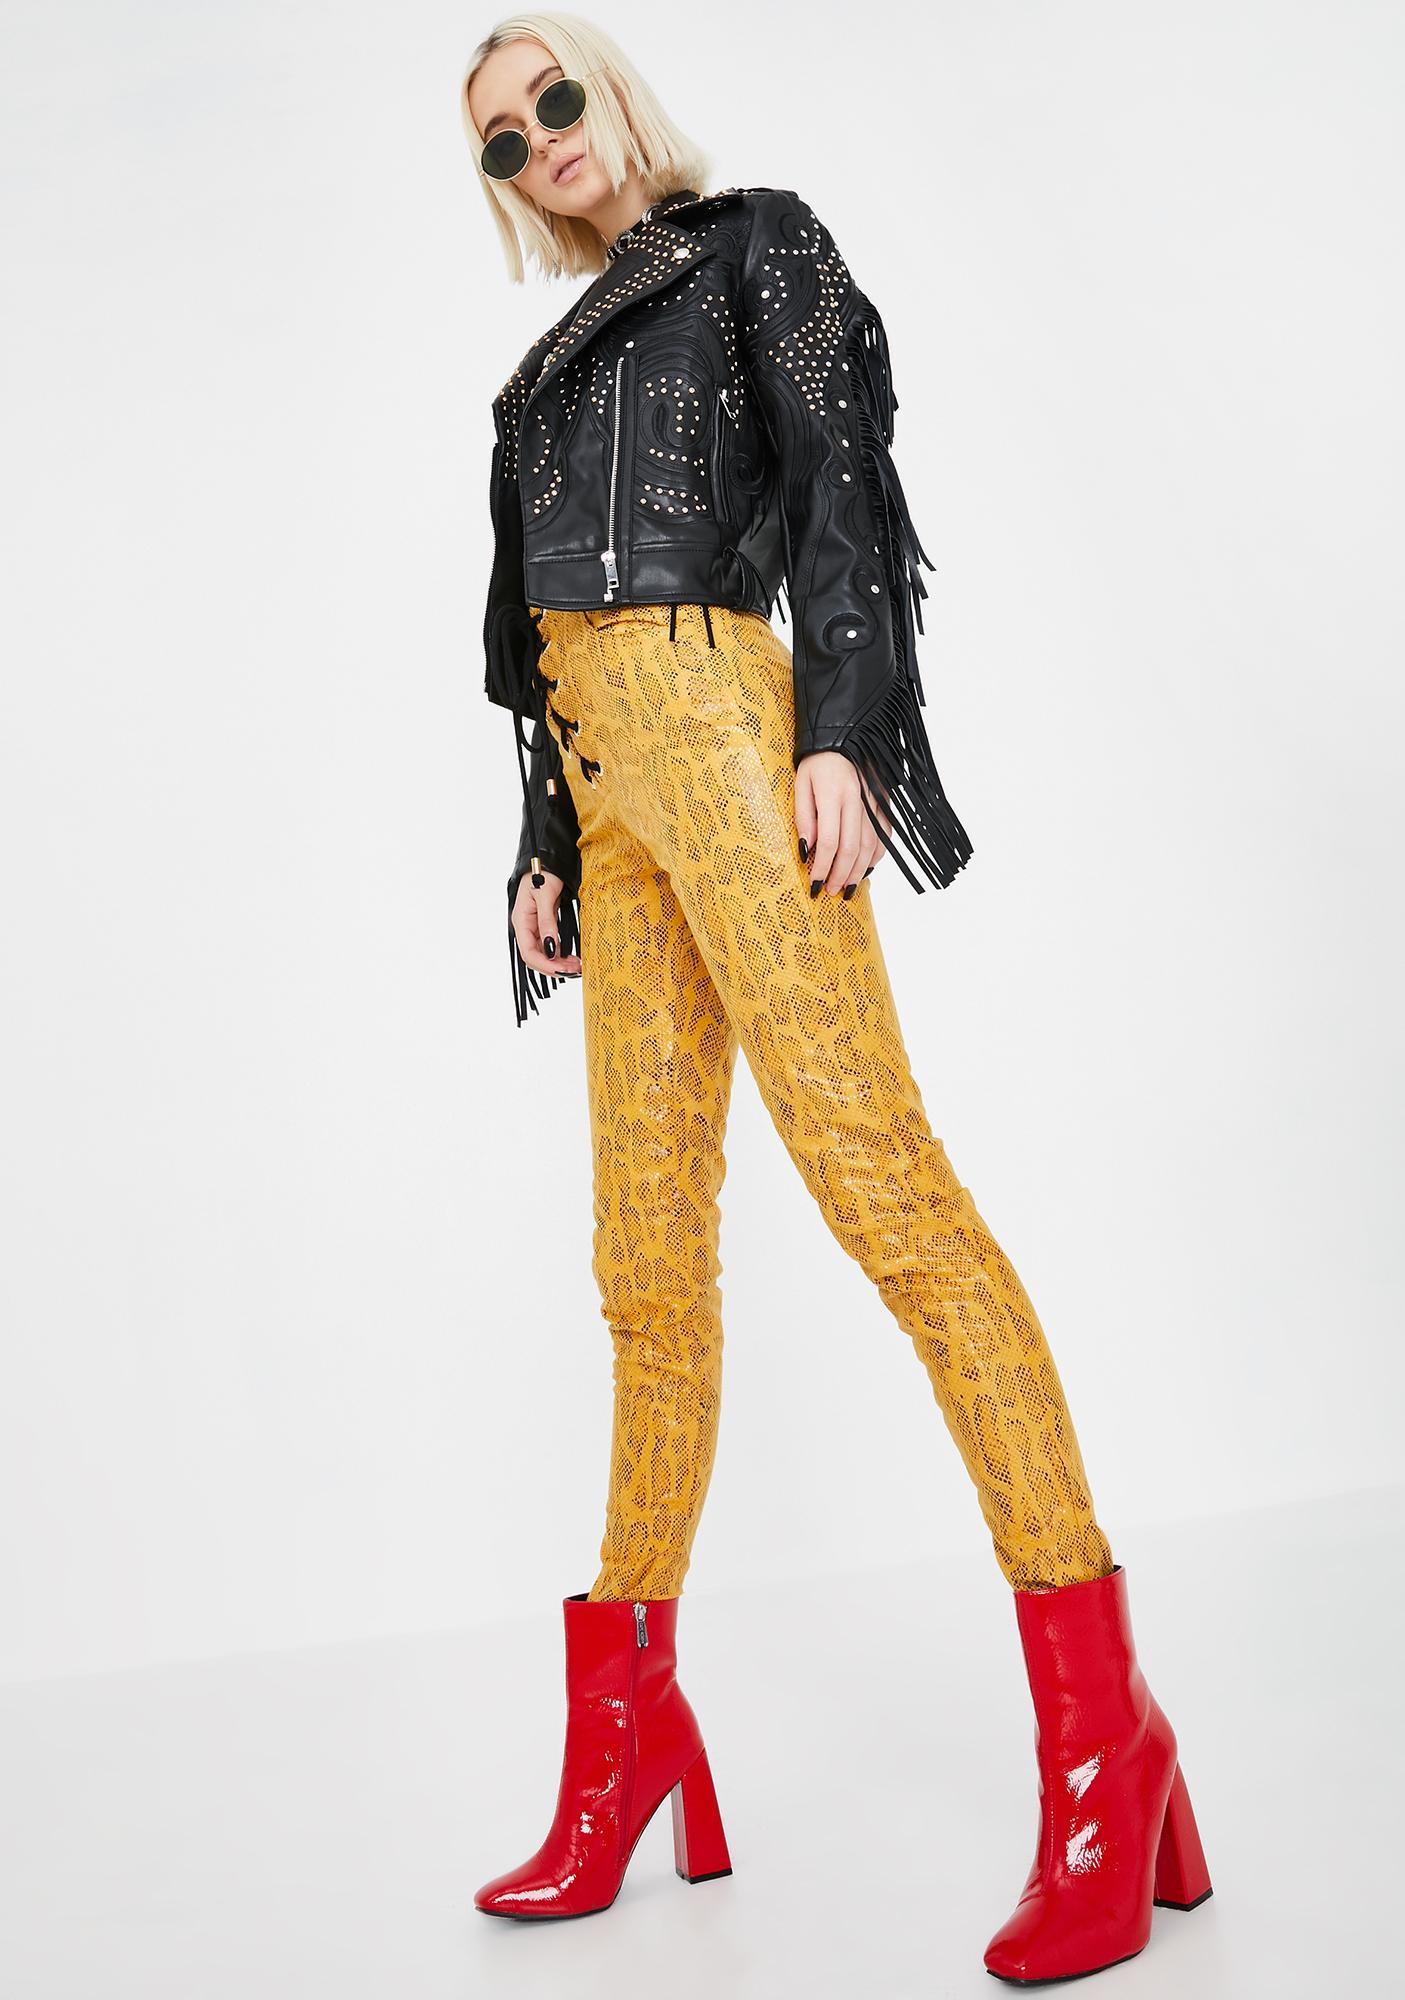 Jagger & Stone Olsen Lace-Up Snakeskin Pants